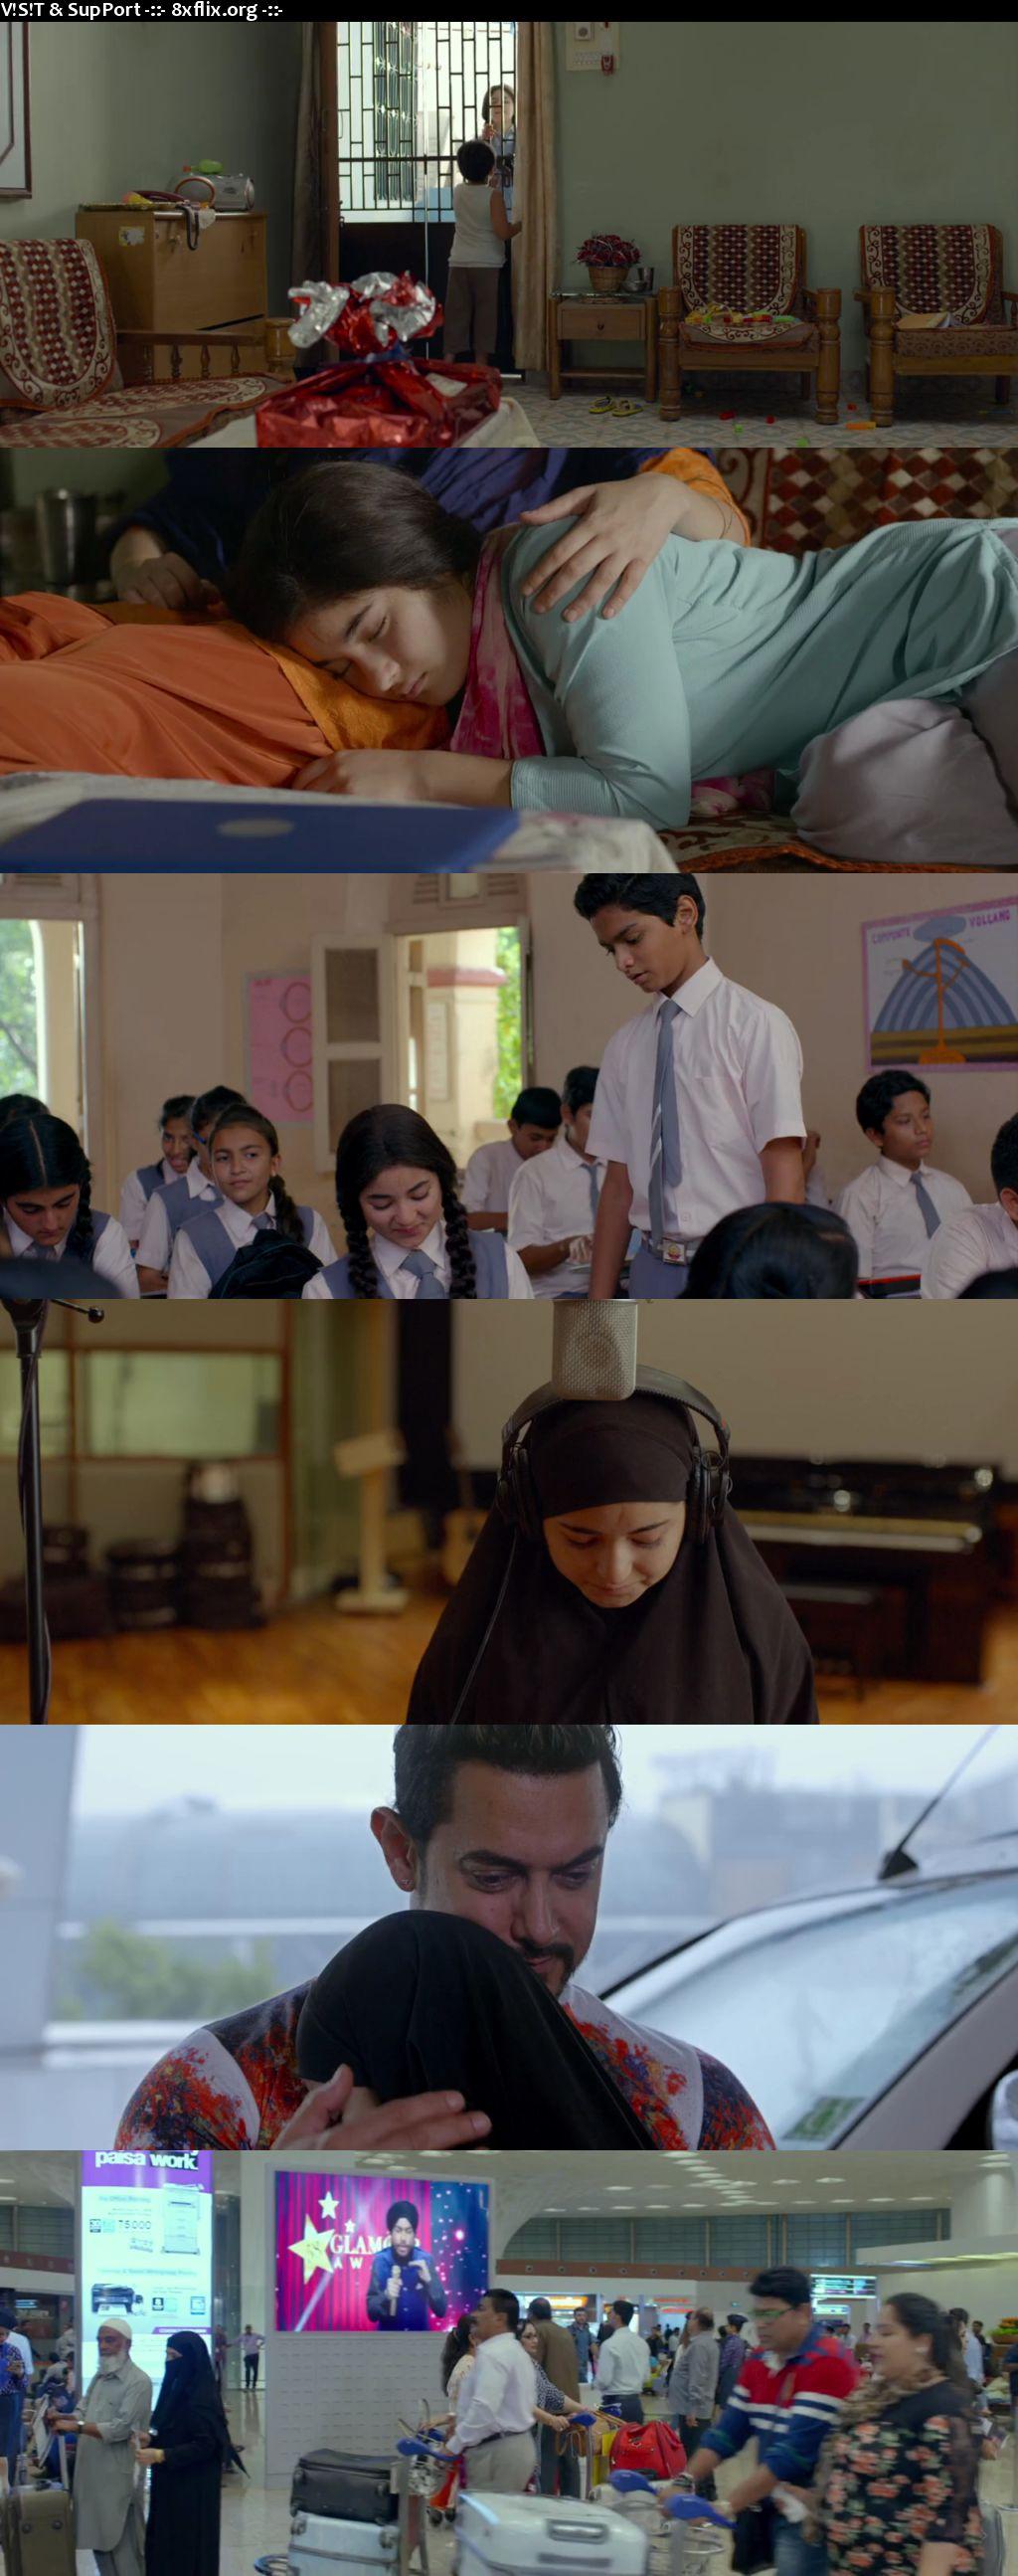 Secret Superstar 2017 Full Hindi Movie Download 720p 480p BRRip HD